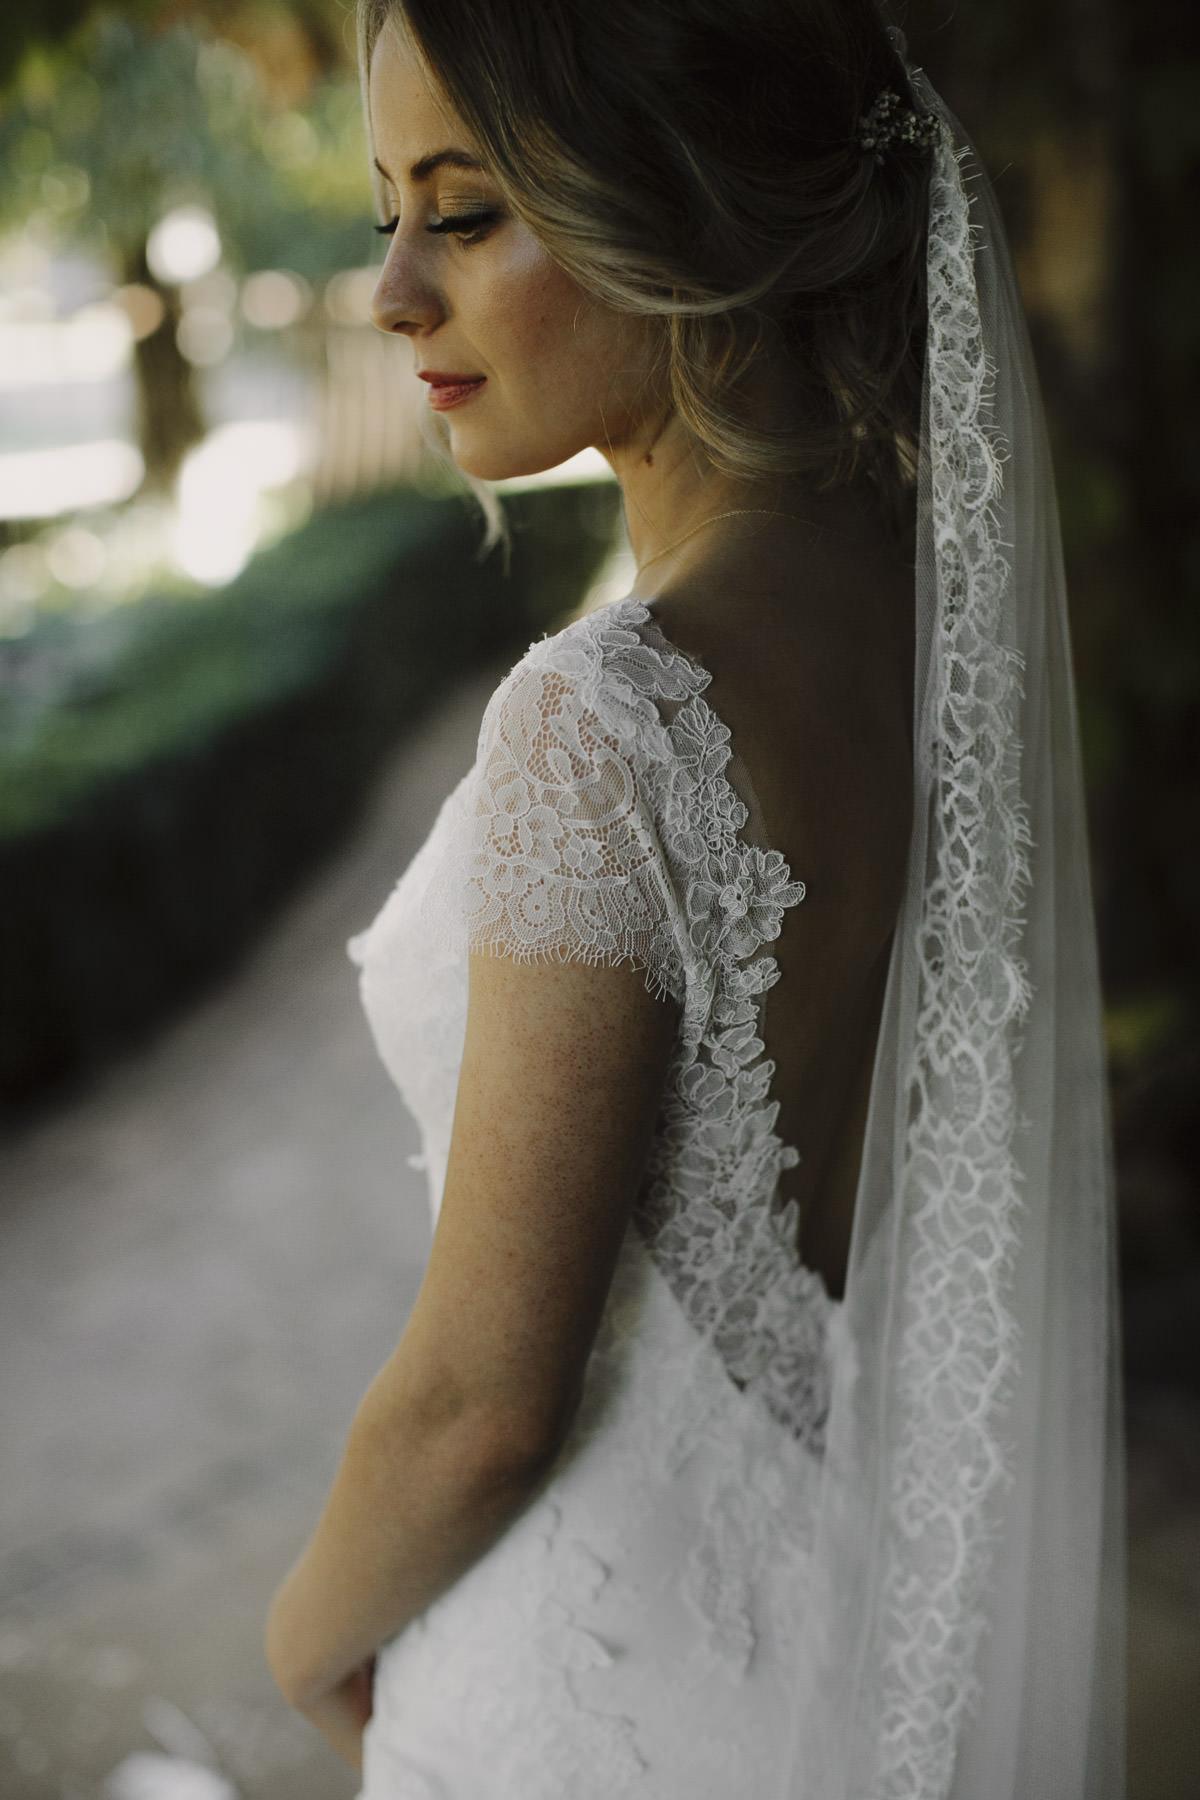 160506_justinaaron_wedding_holly_daniel_pr-59.jpg